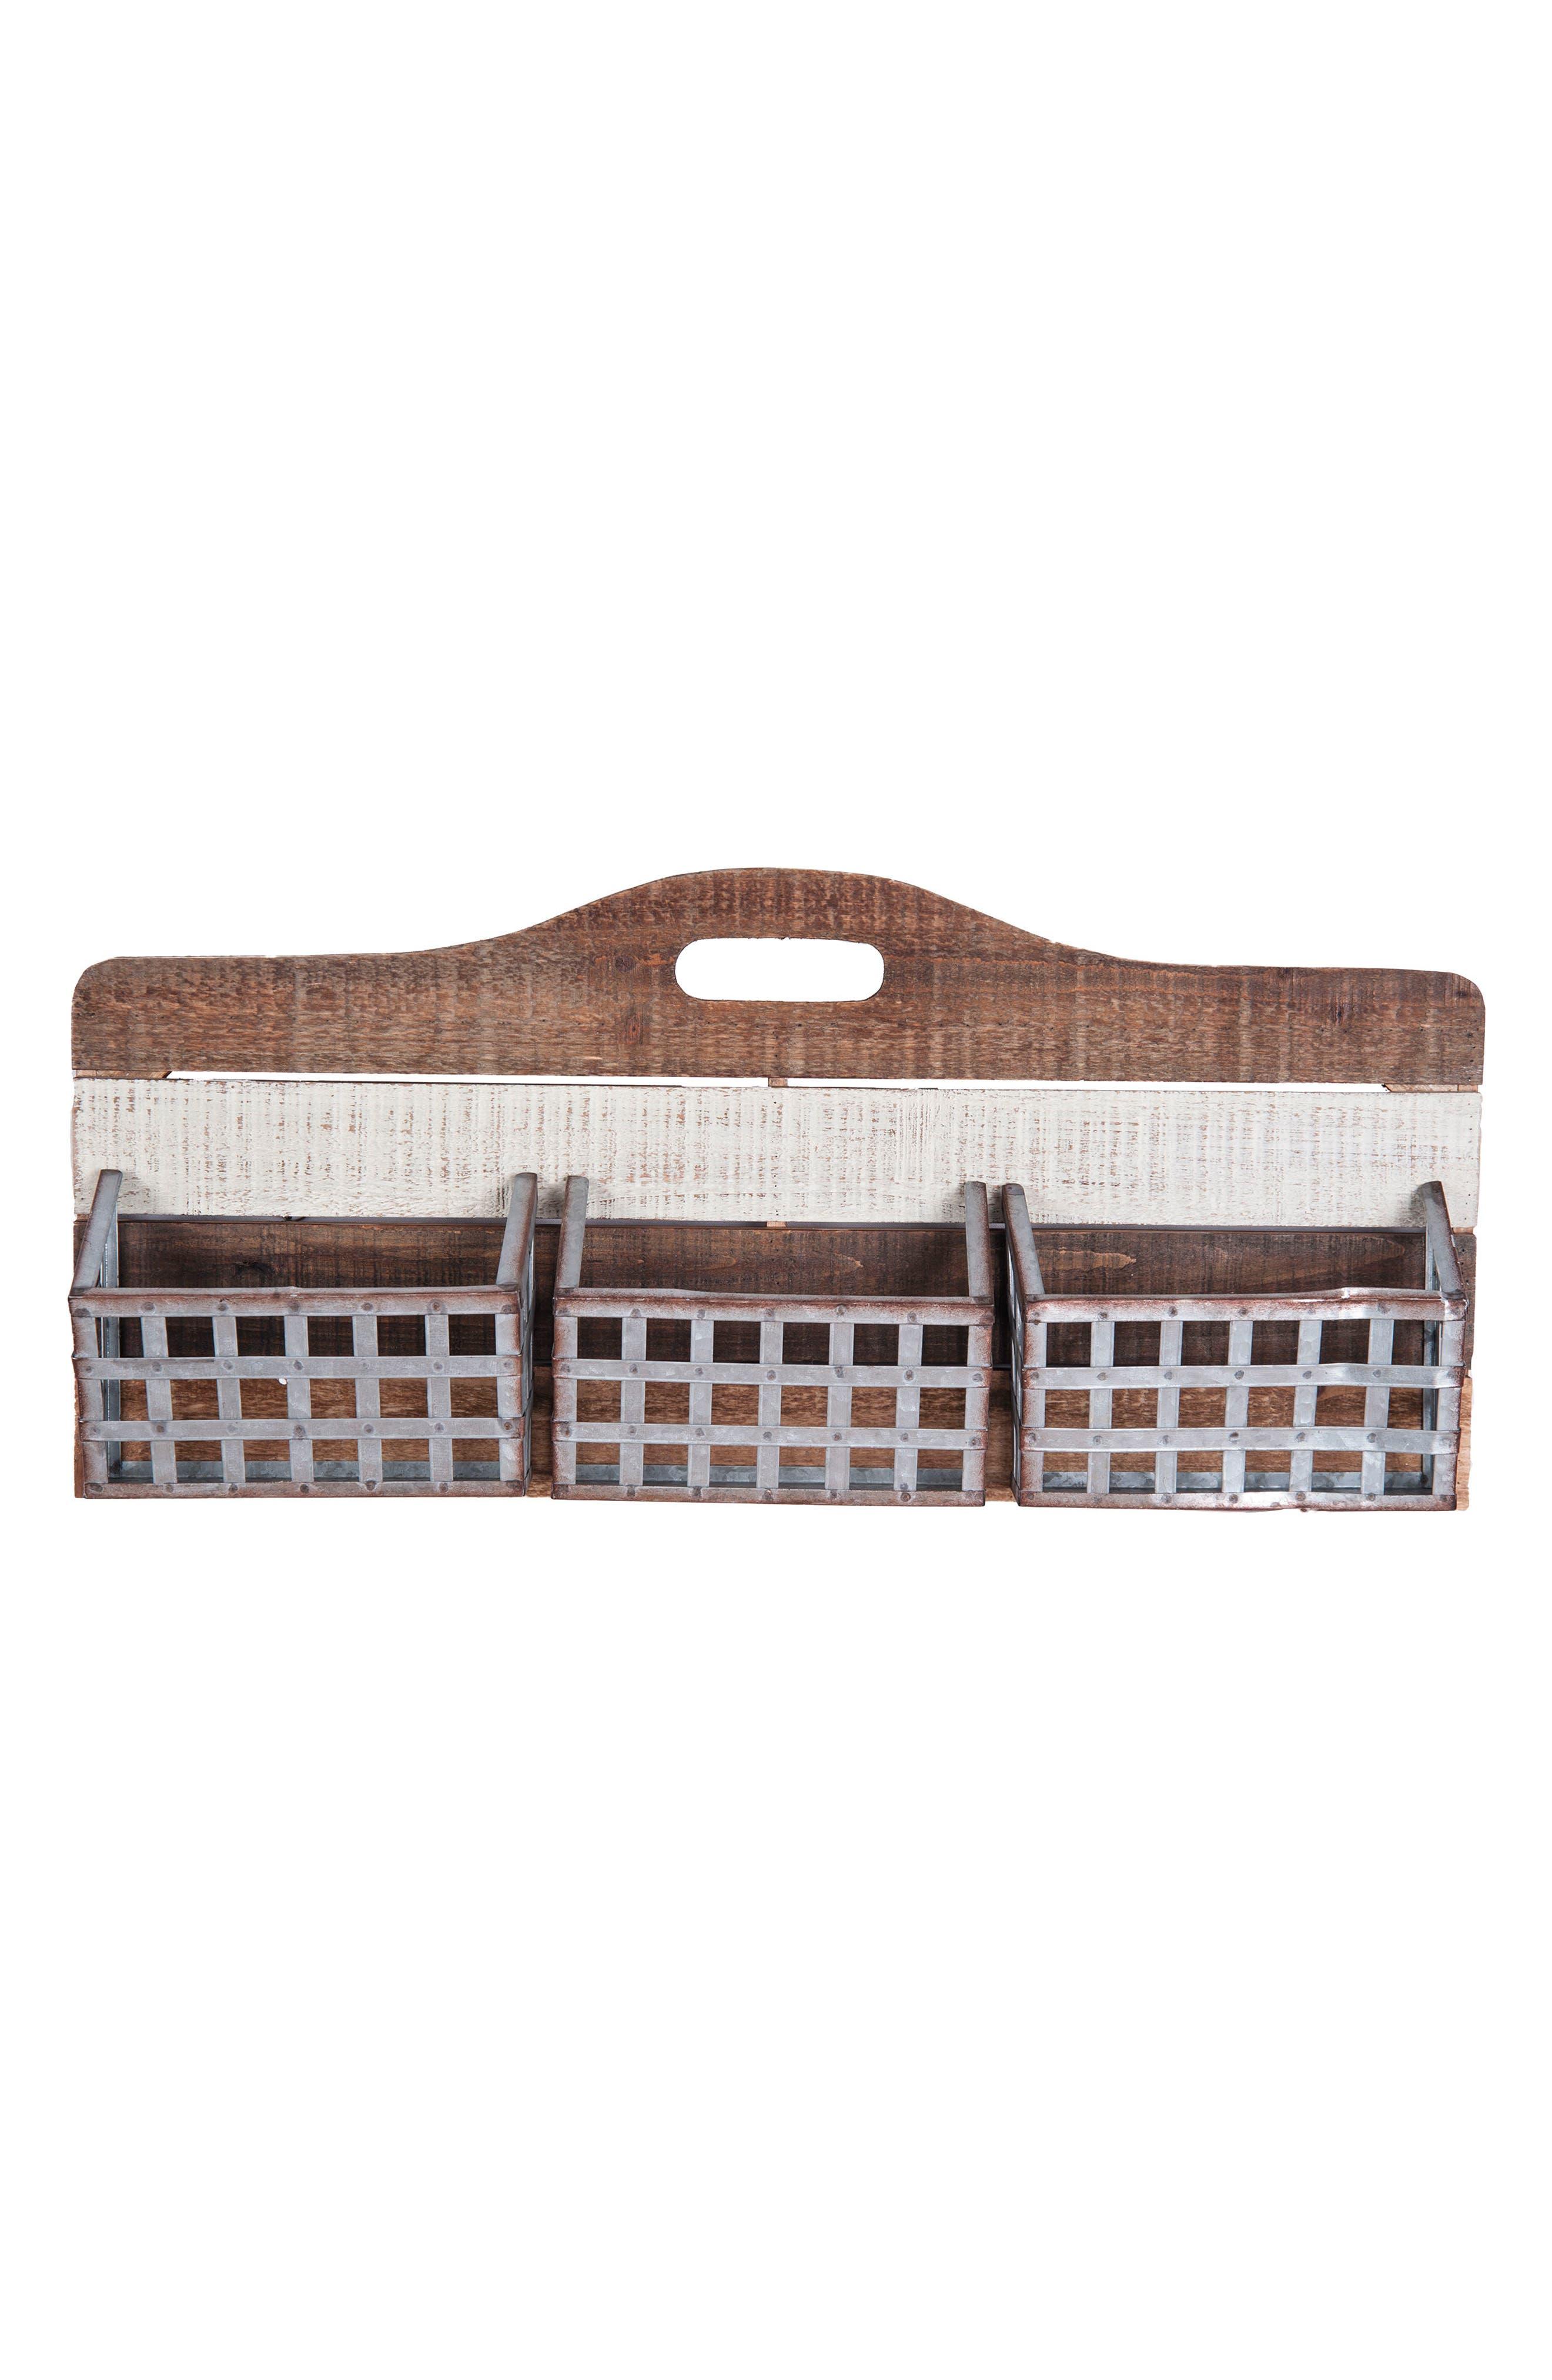 Basket Wall Art,                             Main thumbnail 1, color,                             Wood/ Metal